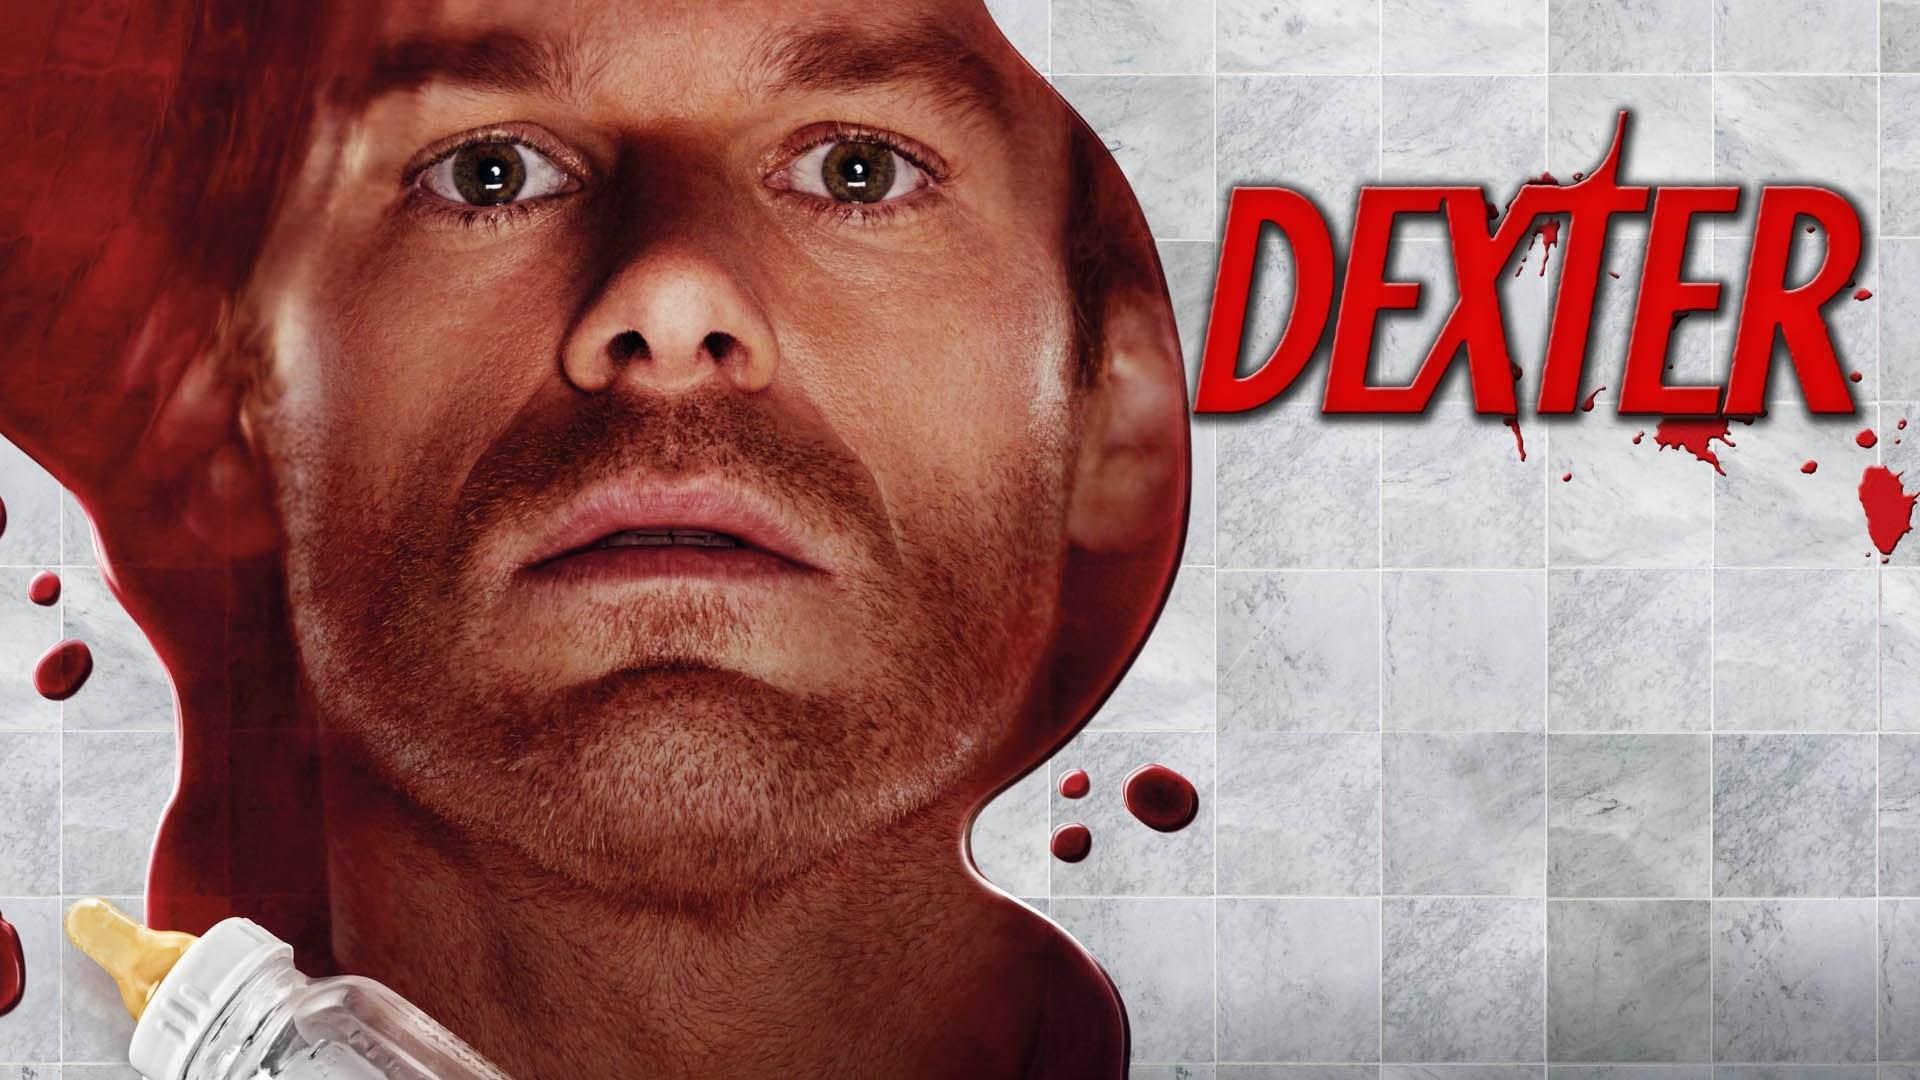 dexter season 7 download